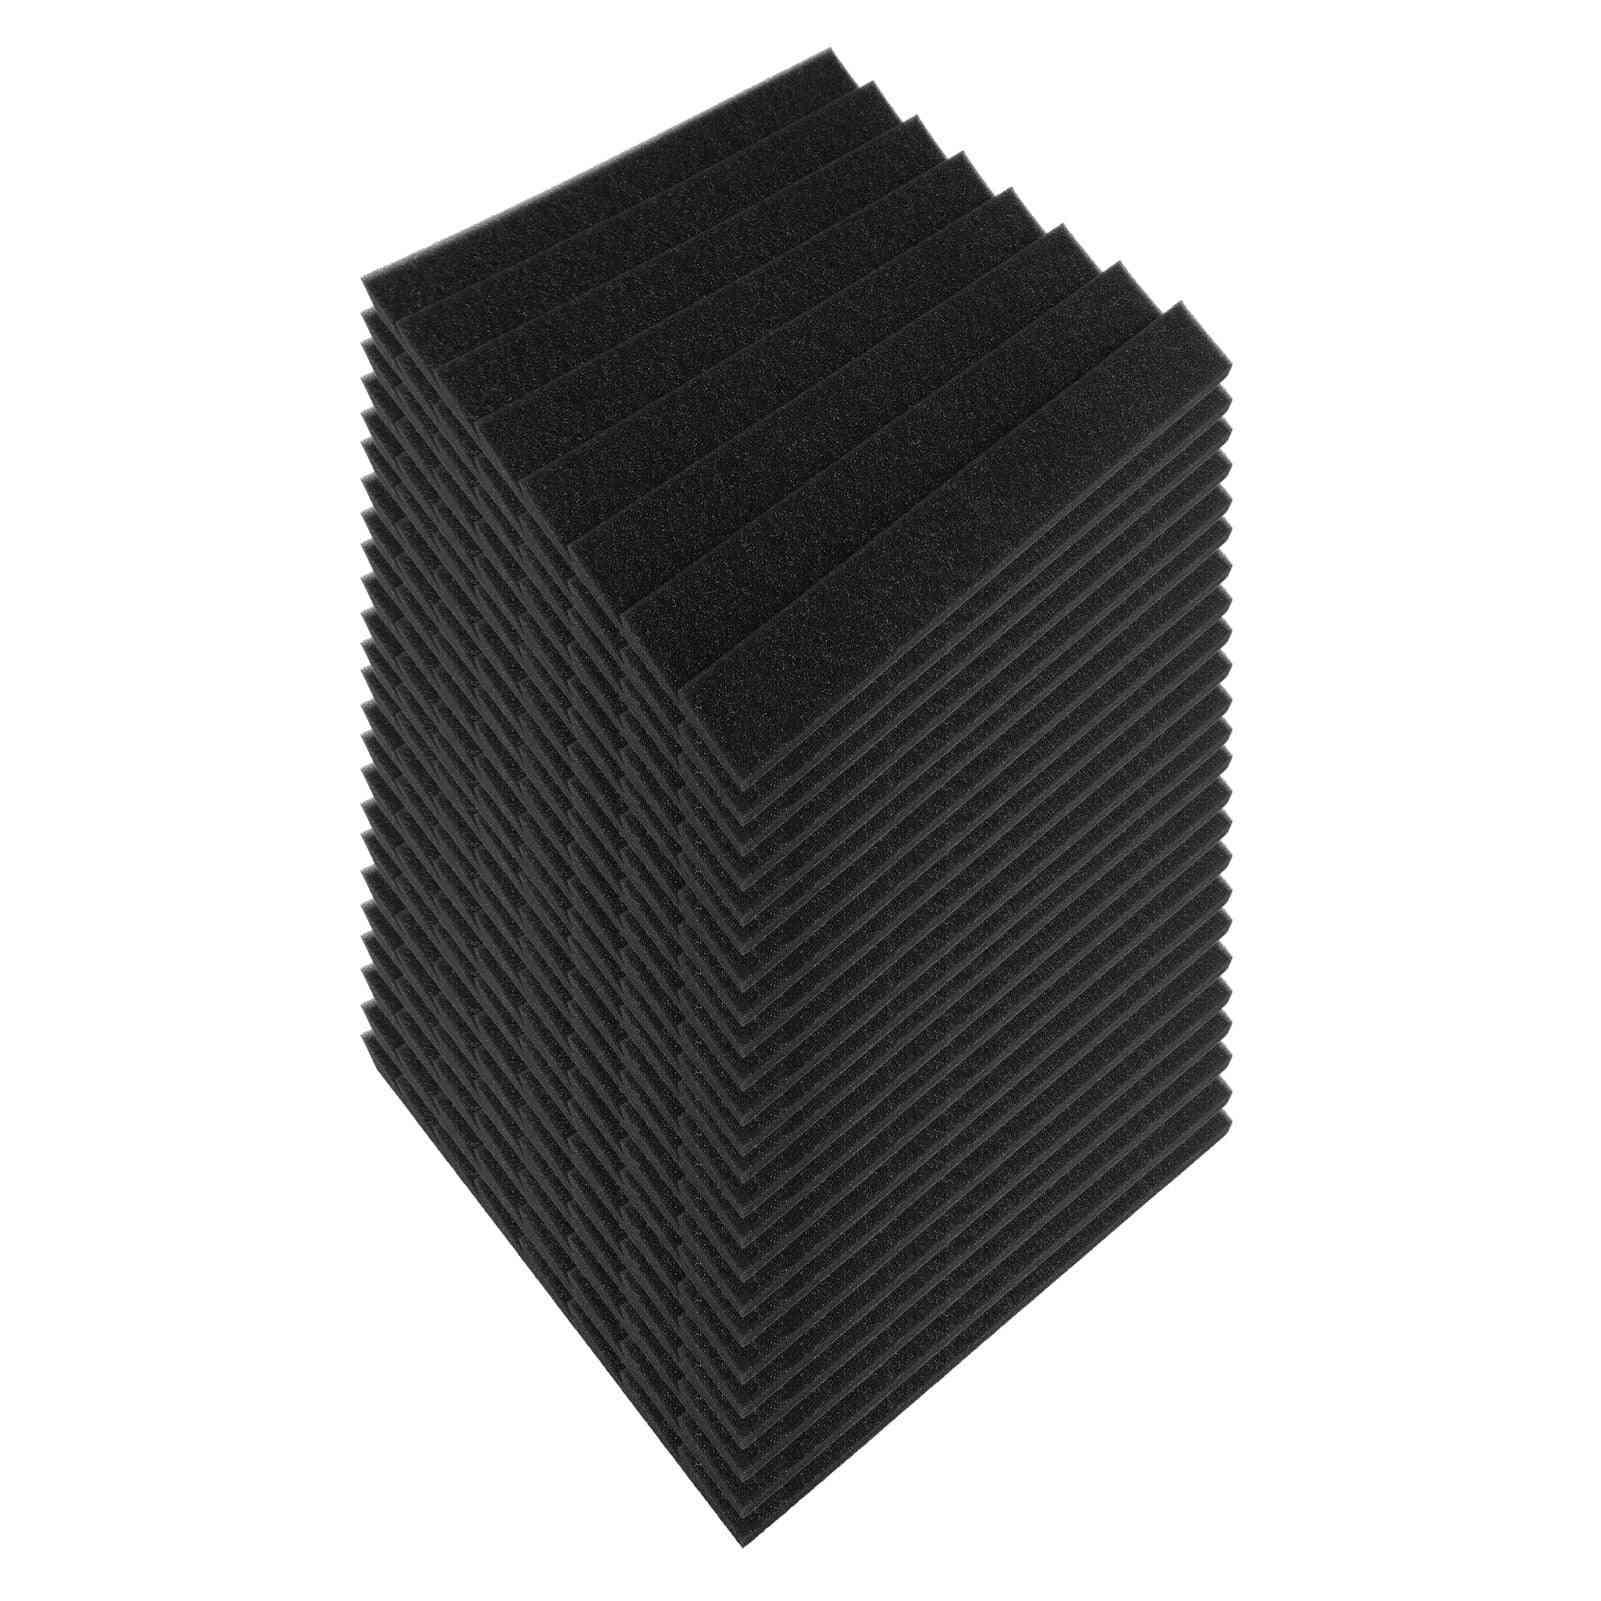 Studio Acoustic Foams Panels Sound Insulation, Soundproof, Absorbing Foam Wall Deadening Flame-retardant